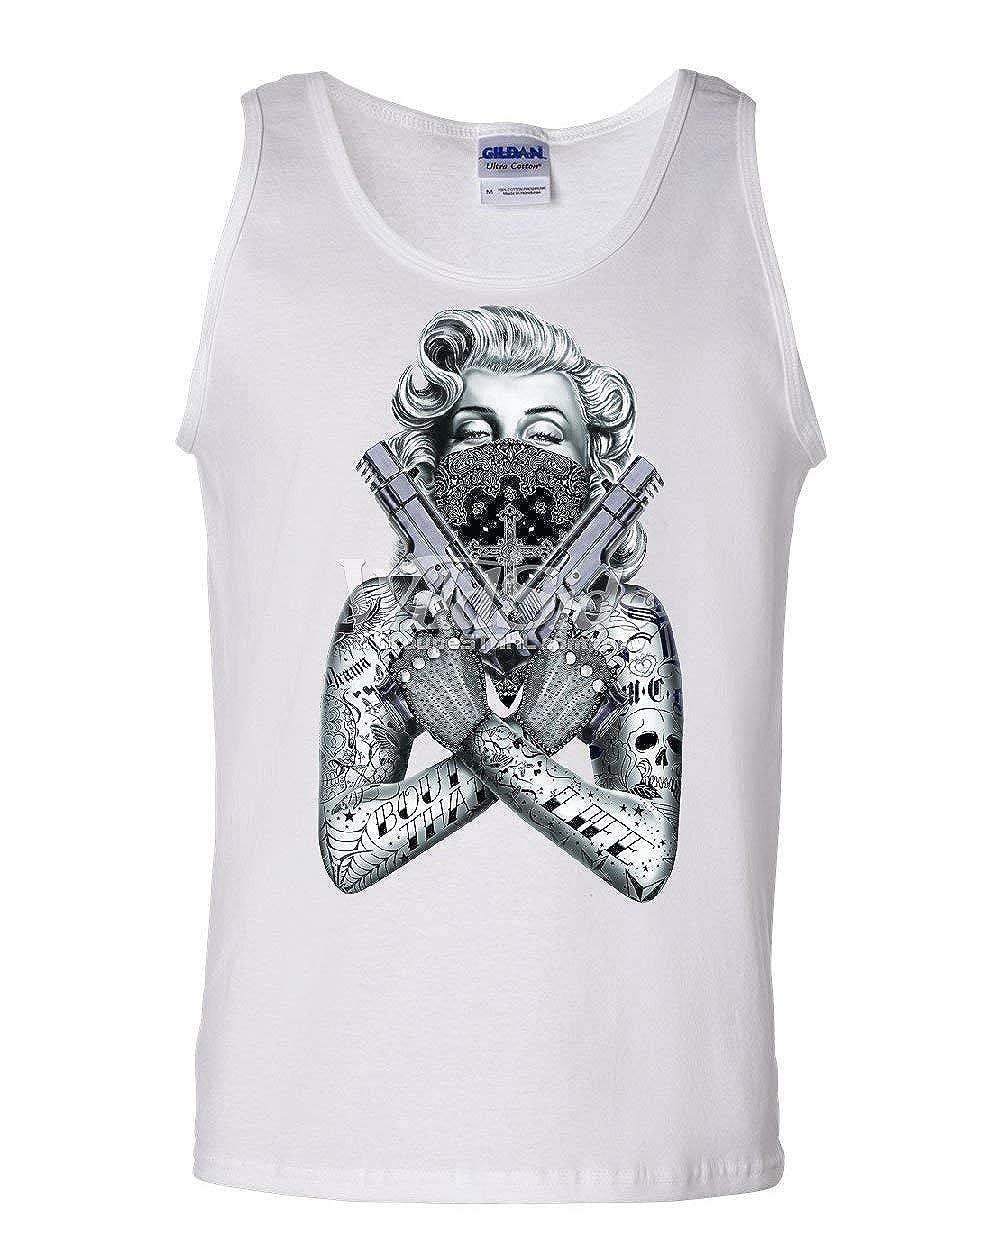 Tattooed Marilyn Guns Sweatshirt Bandana Thug Life Badass Gangsta Sweater